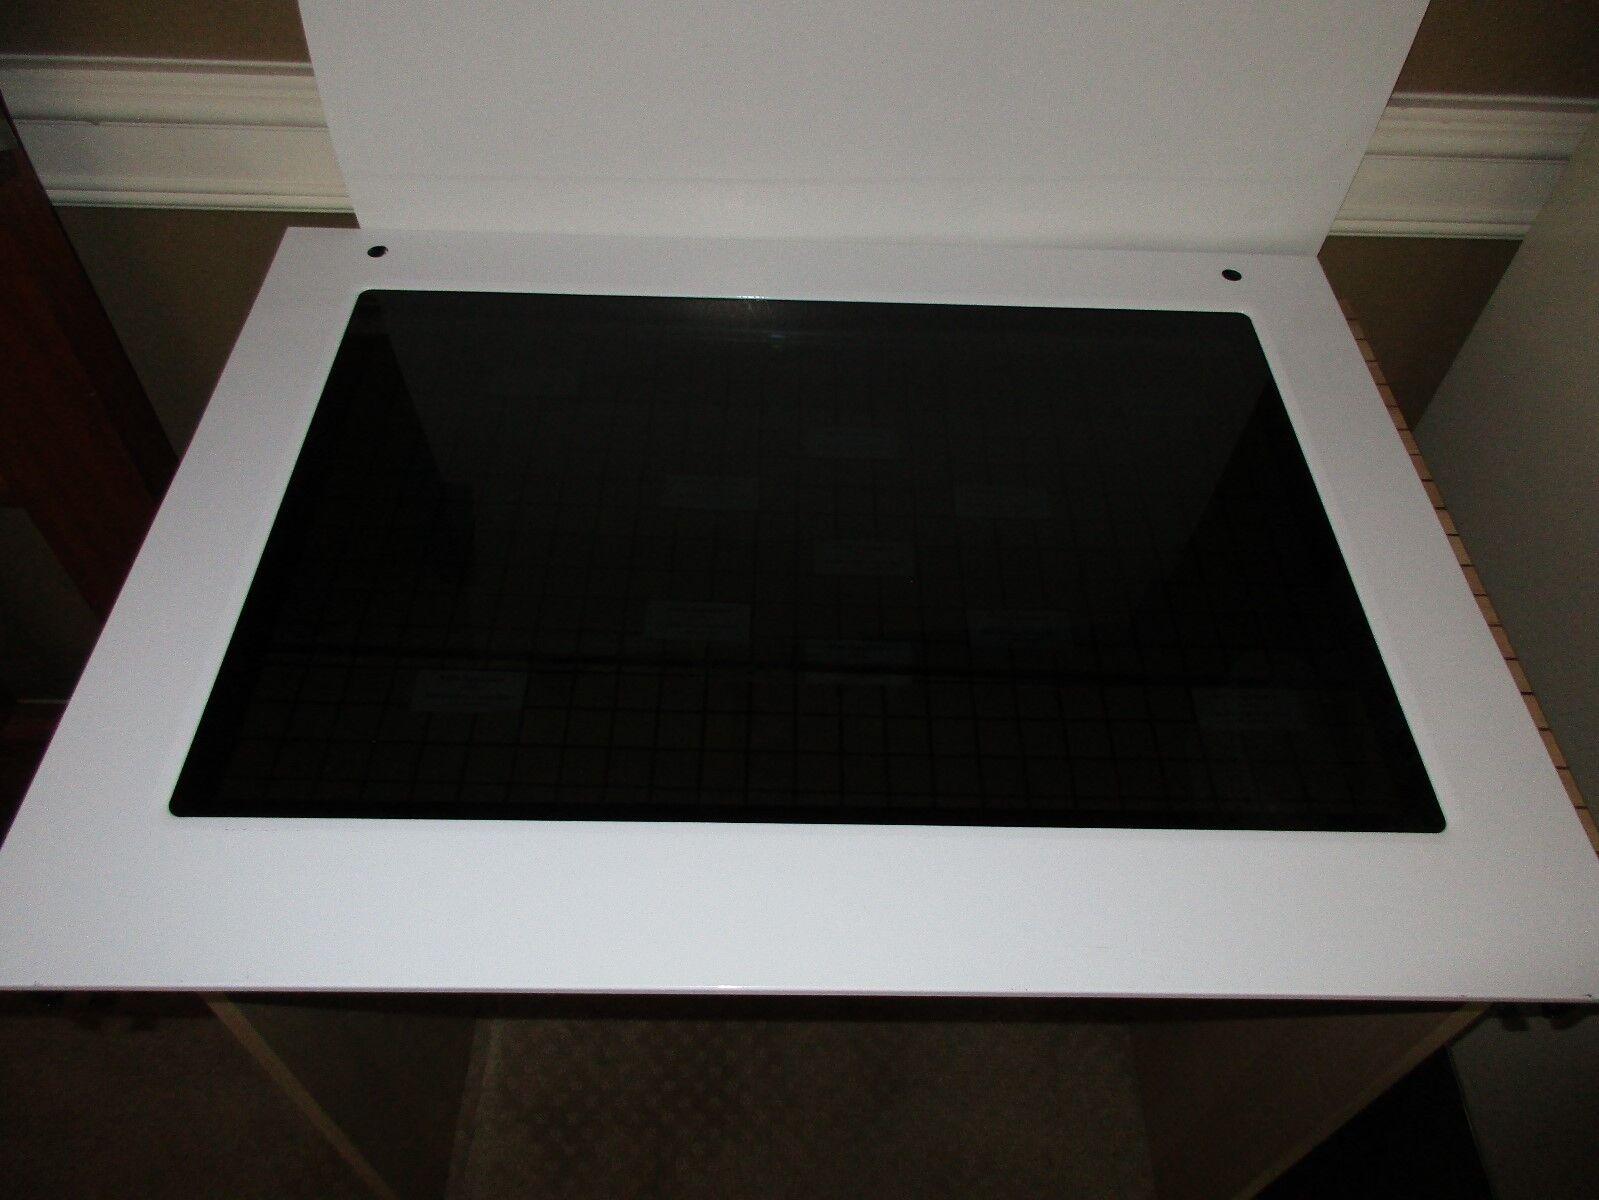 NEW Kitchen Aid Door Glass - Weiß W10582013 SATISF GUAR & Free Expd Ship